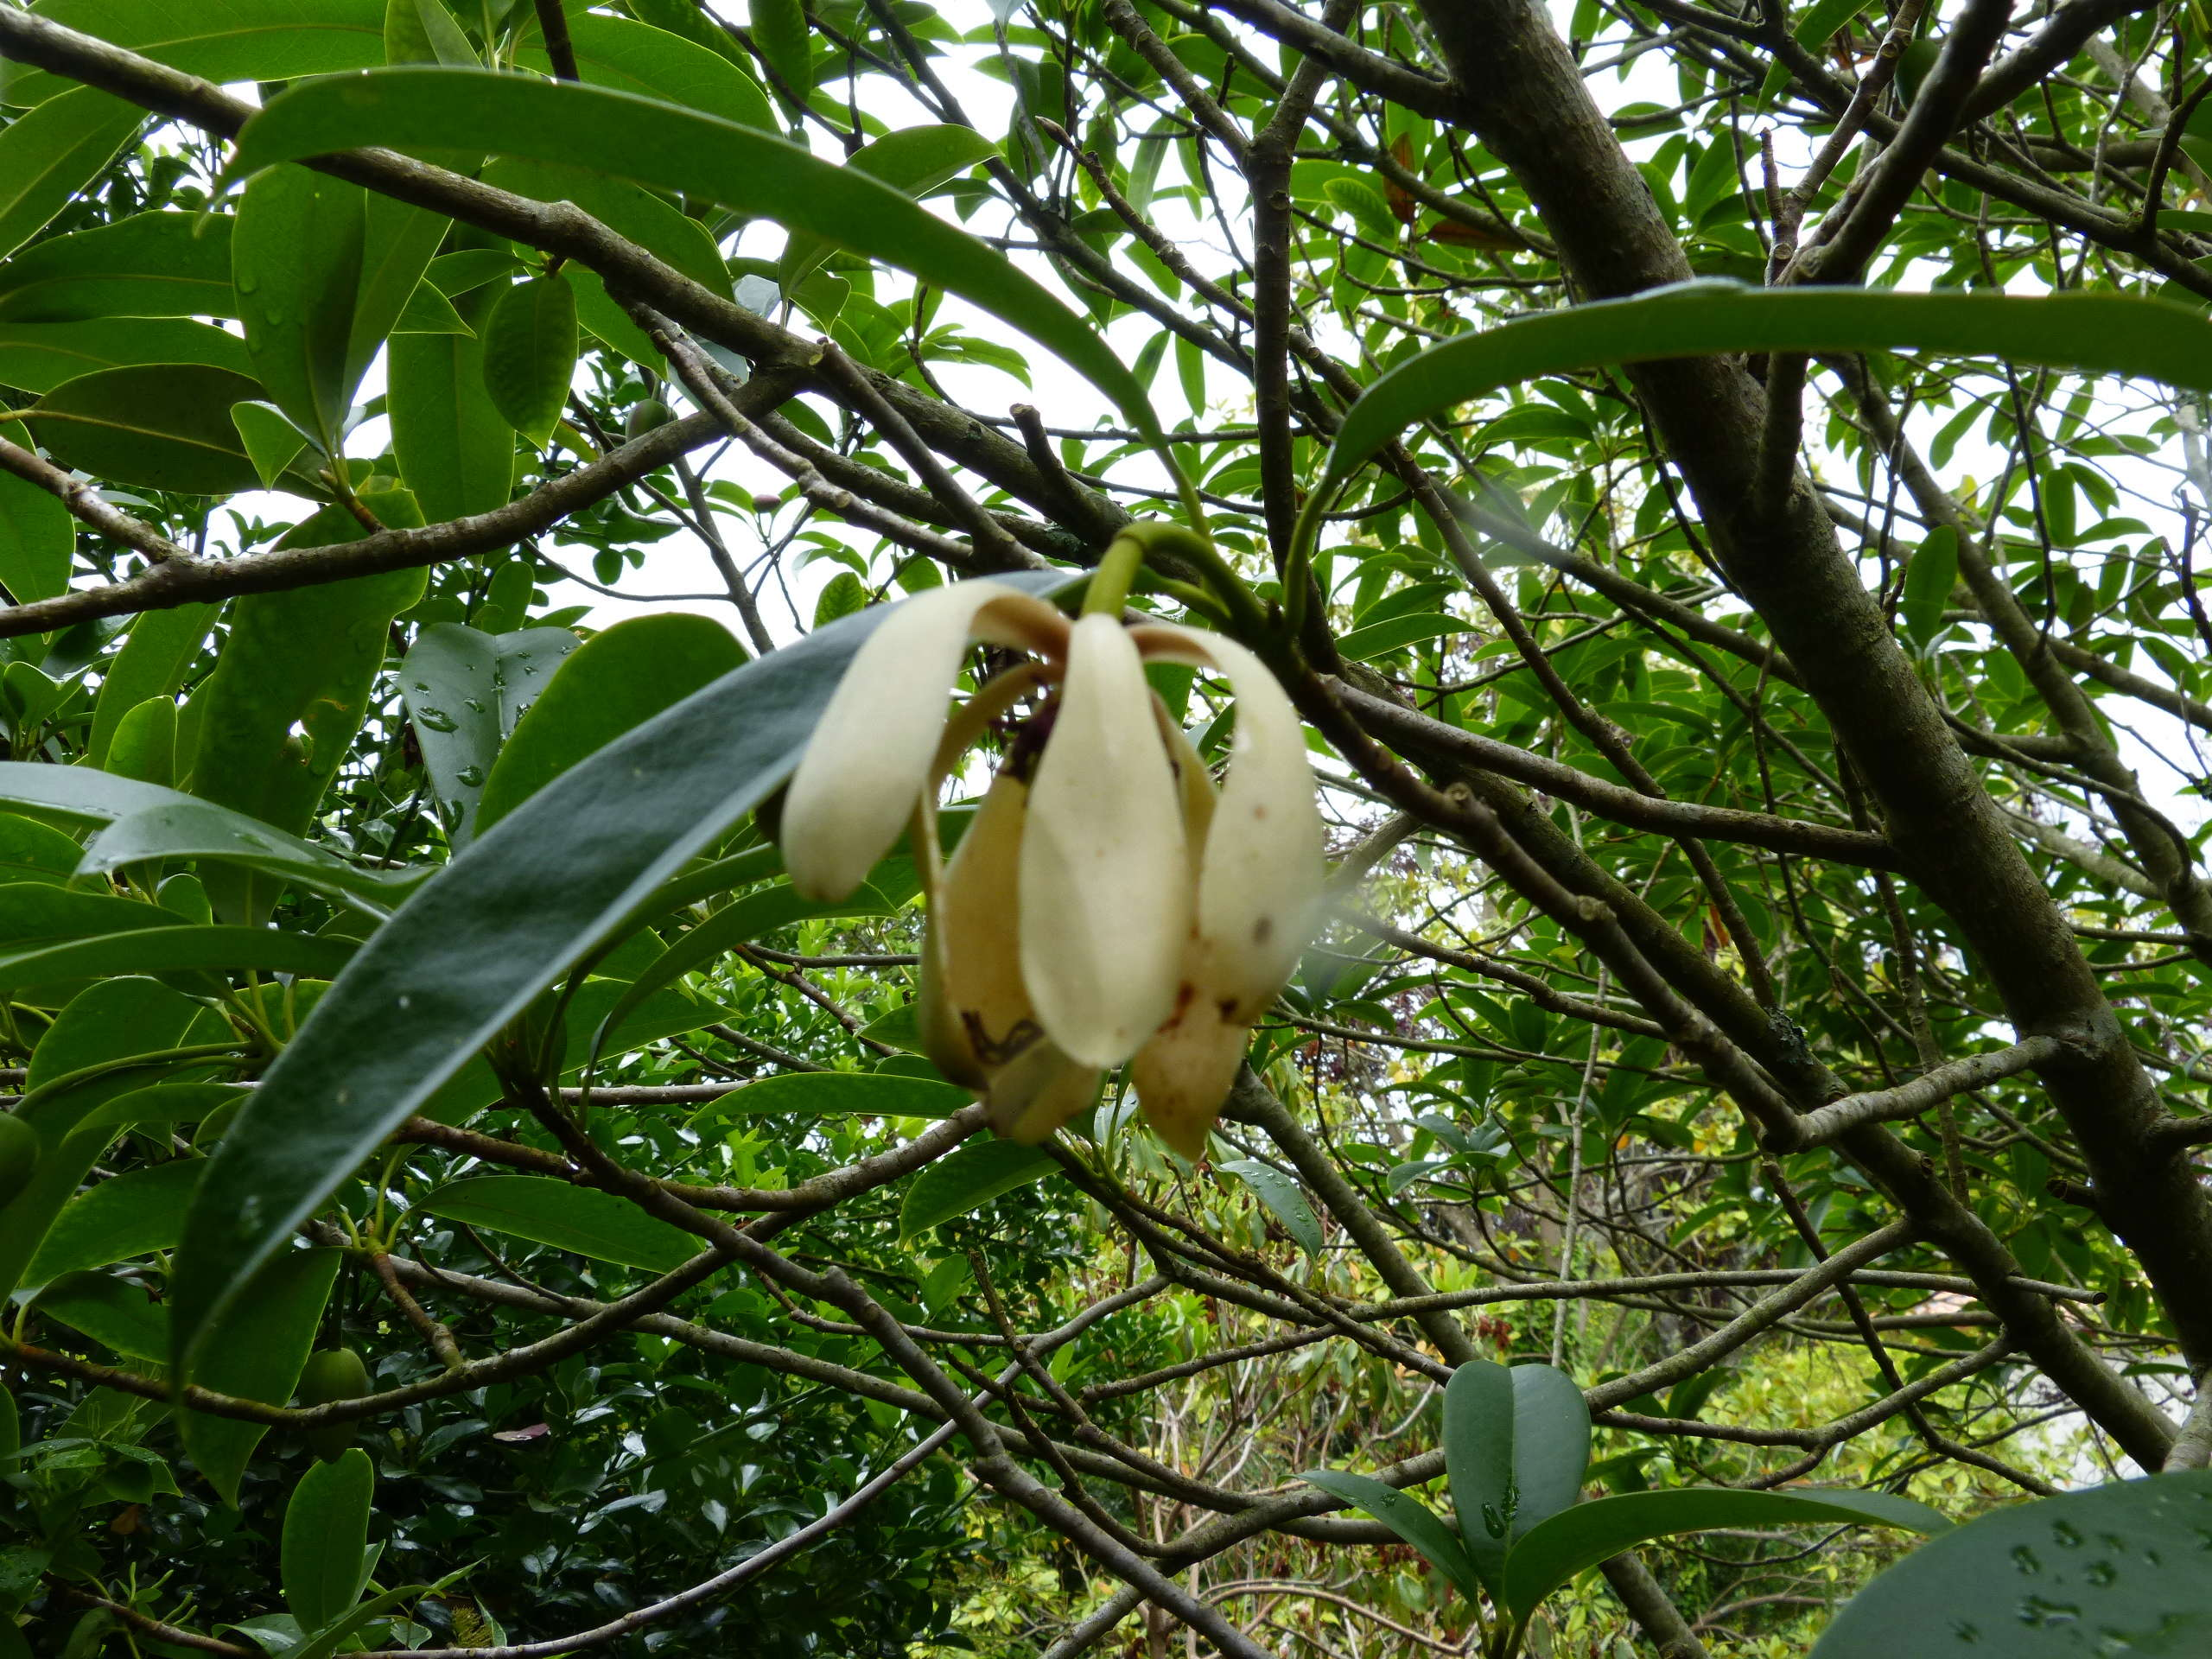 Magnolia conifera var. chingii (= Manglietia chingii) Mangli19